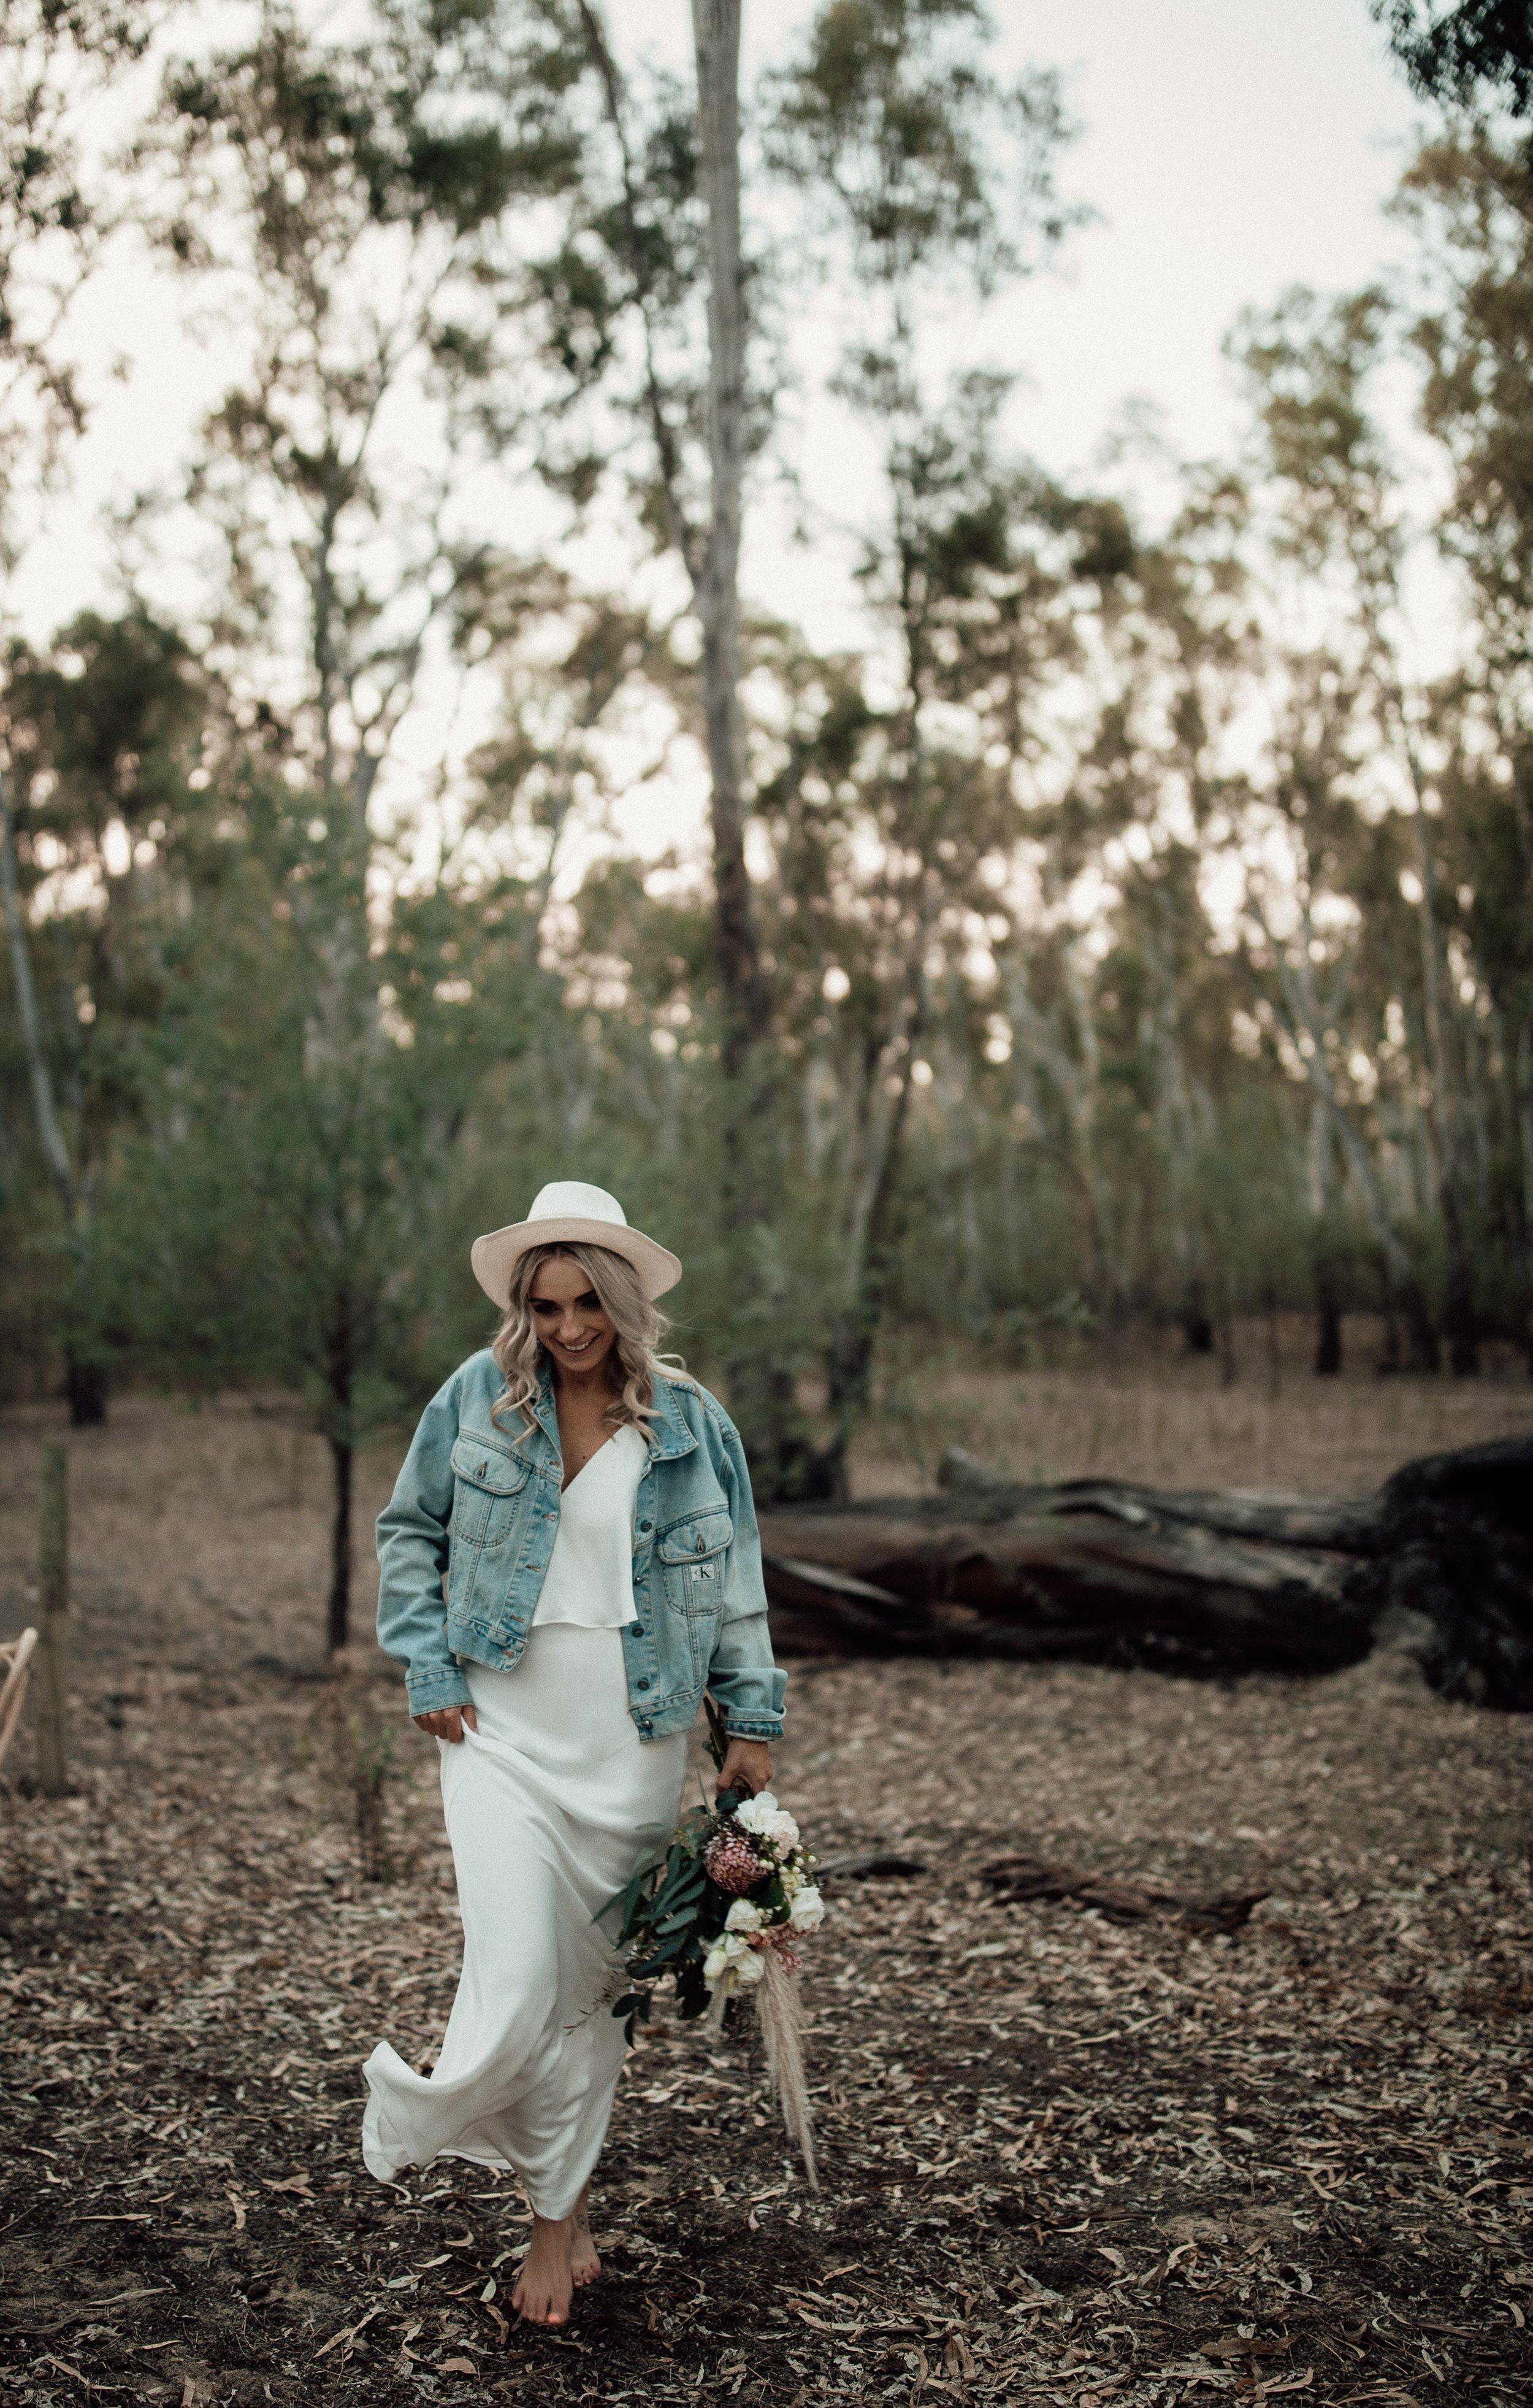 mickalathomas_puremacphotography_weddingphotographer_couplephotographer_Sheppartonphotographer_1503.jpg